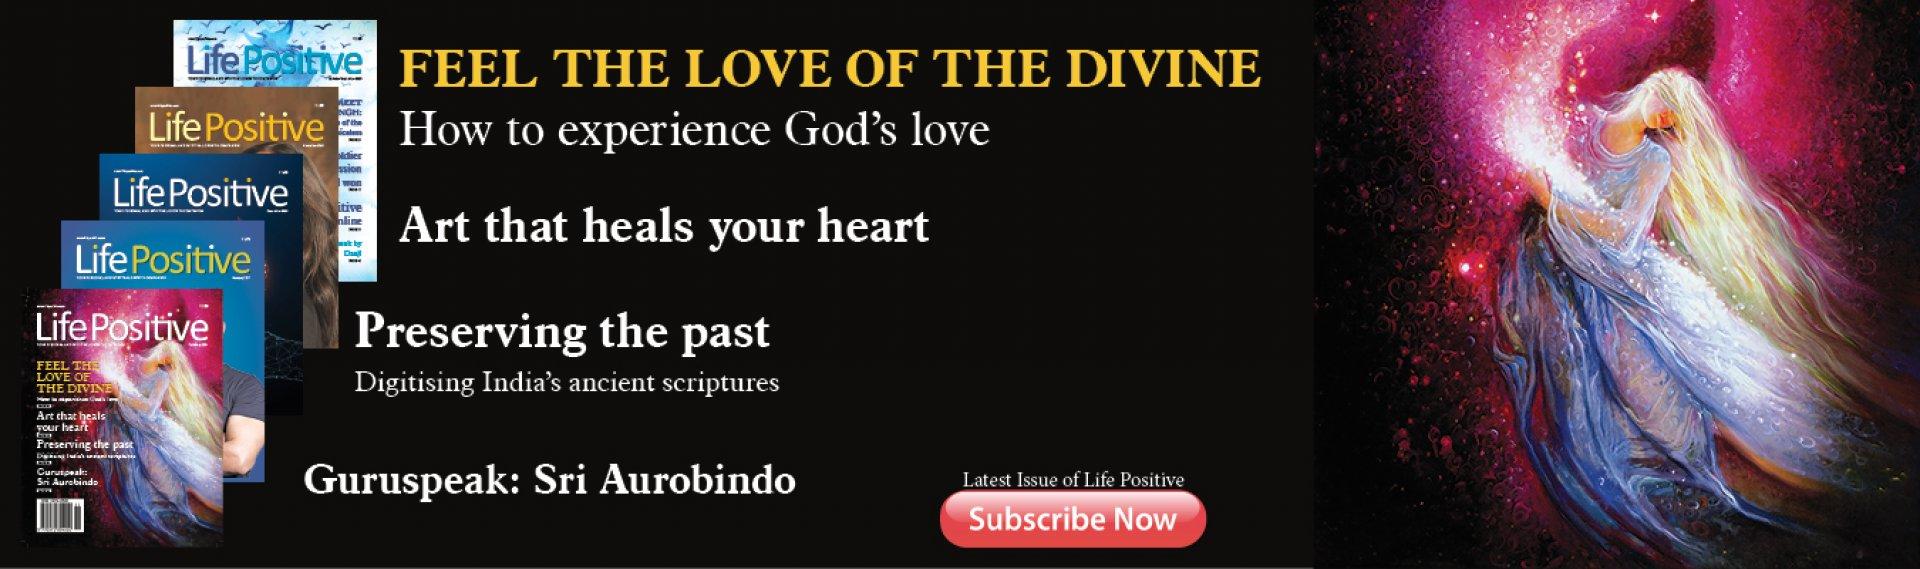 Spiritual growth and Healing Magazine